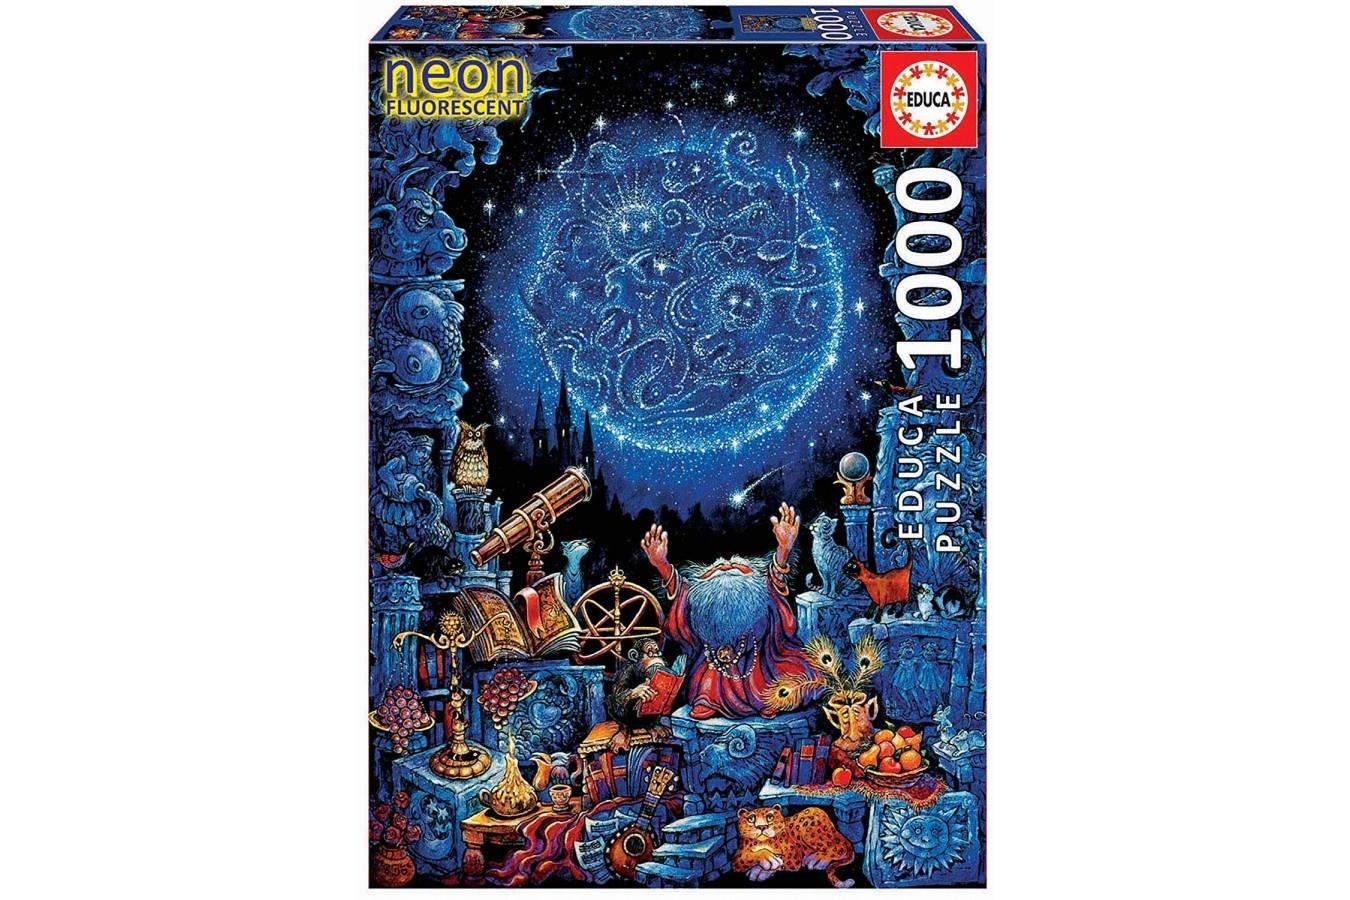 JOHN HANSEN COMPANY ED1000 ASTROLOGER 2 (NEON)